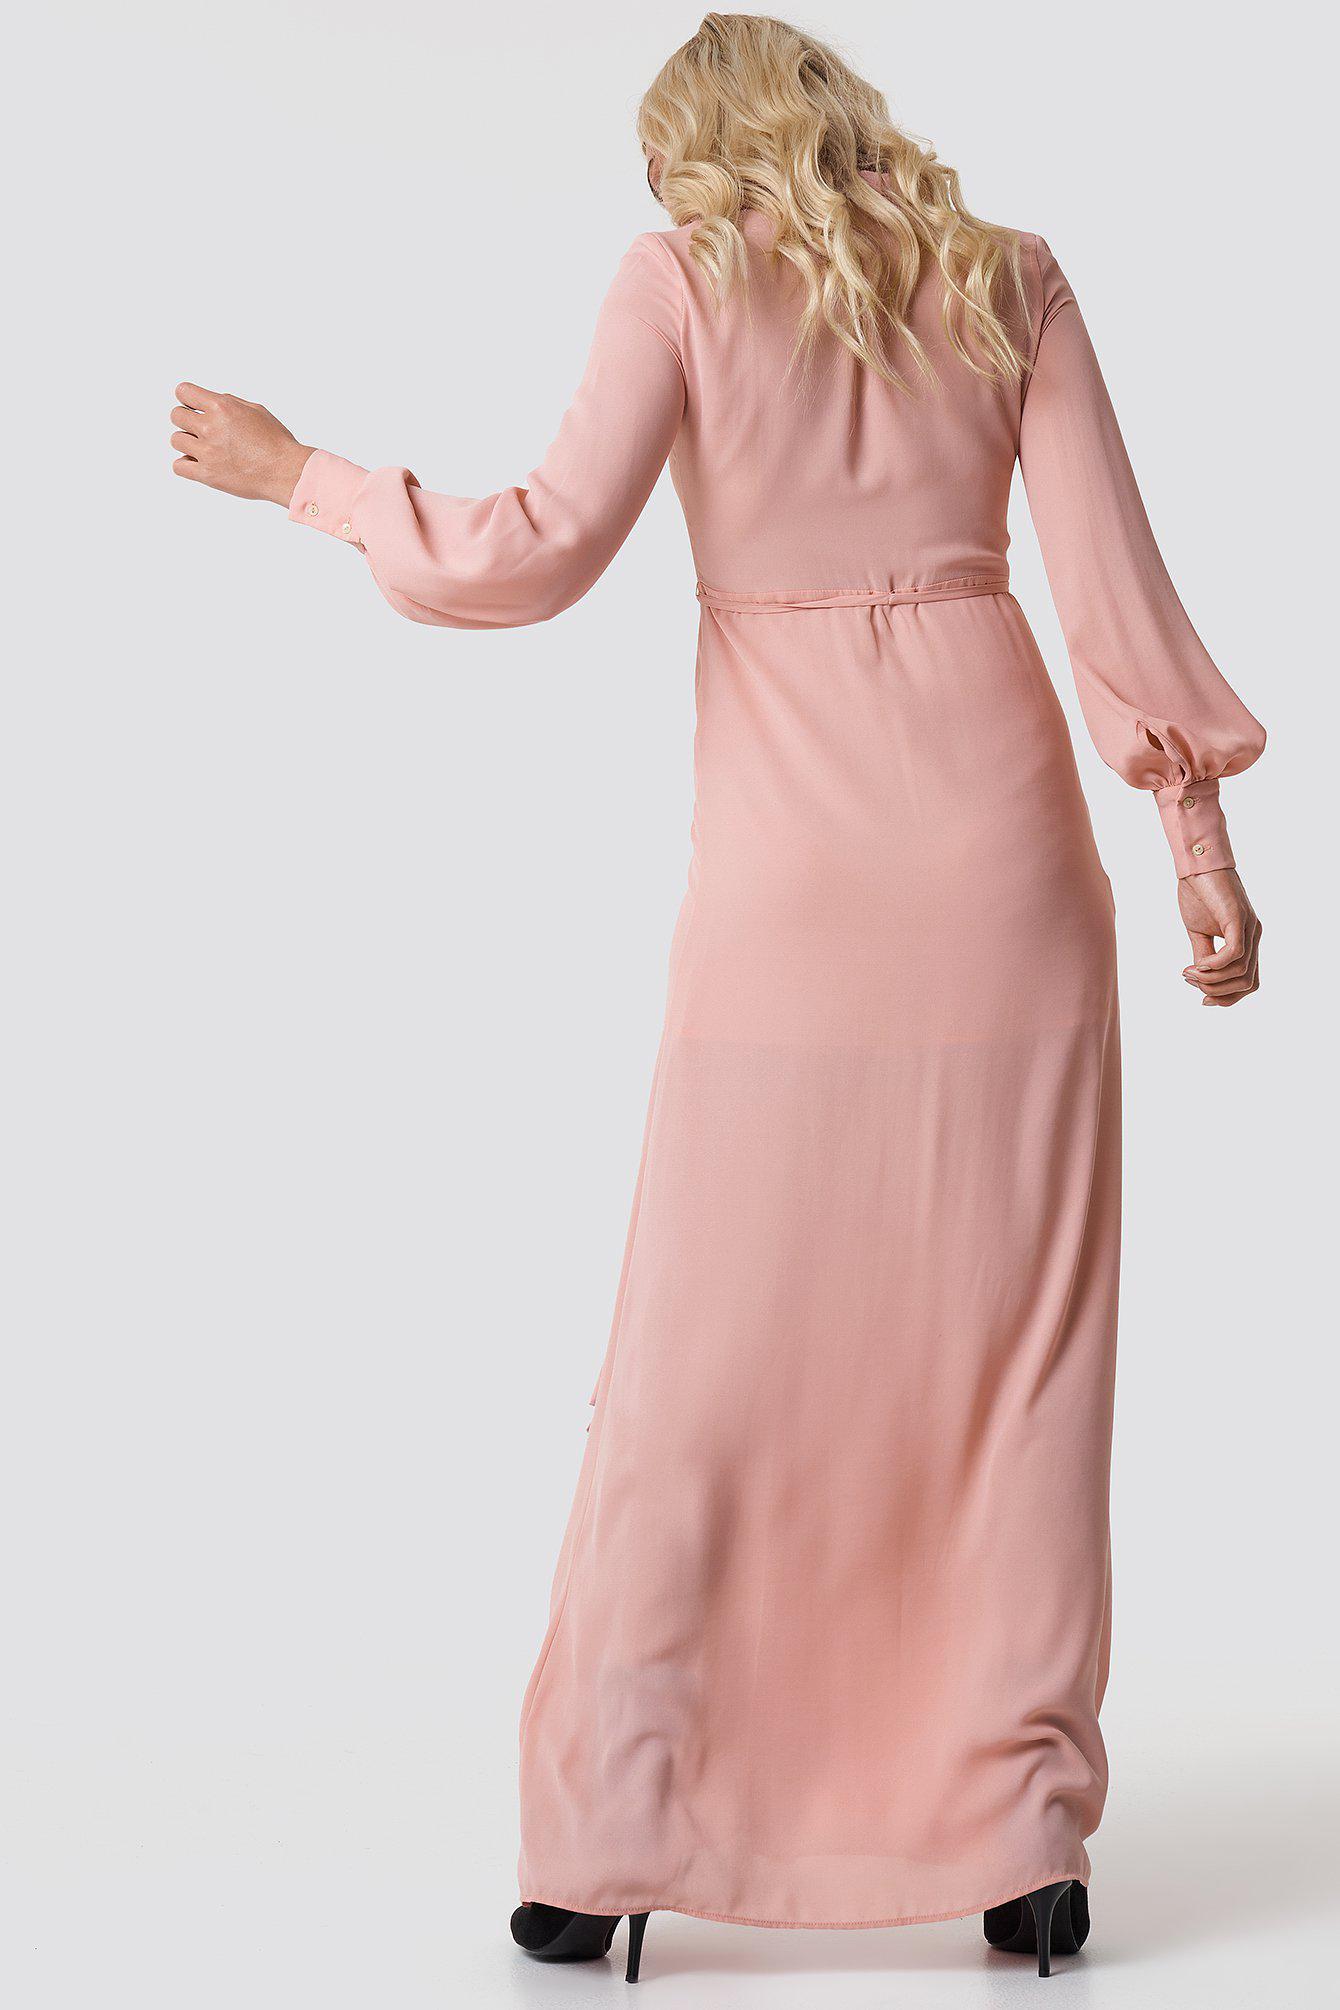 f200d583ba8 Mango - Mia-a Maxi Dress Pastel Pink - Lyst. View fullscreen